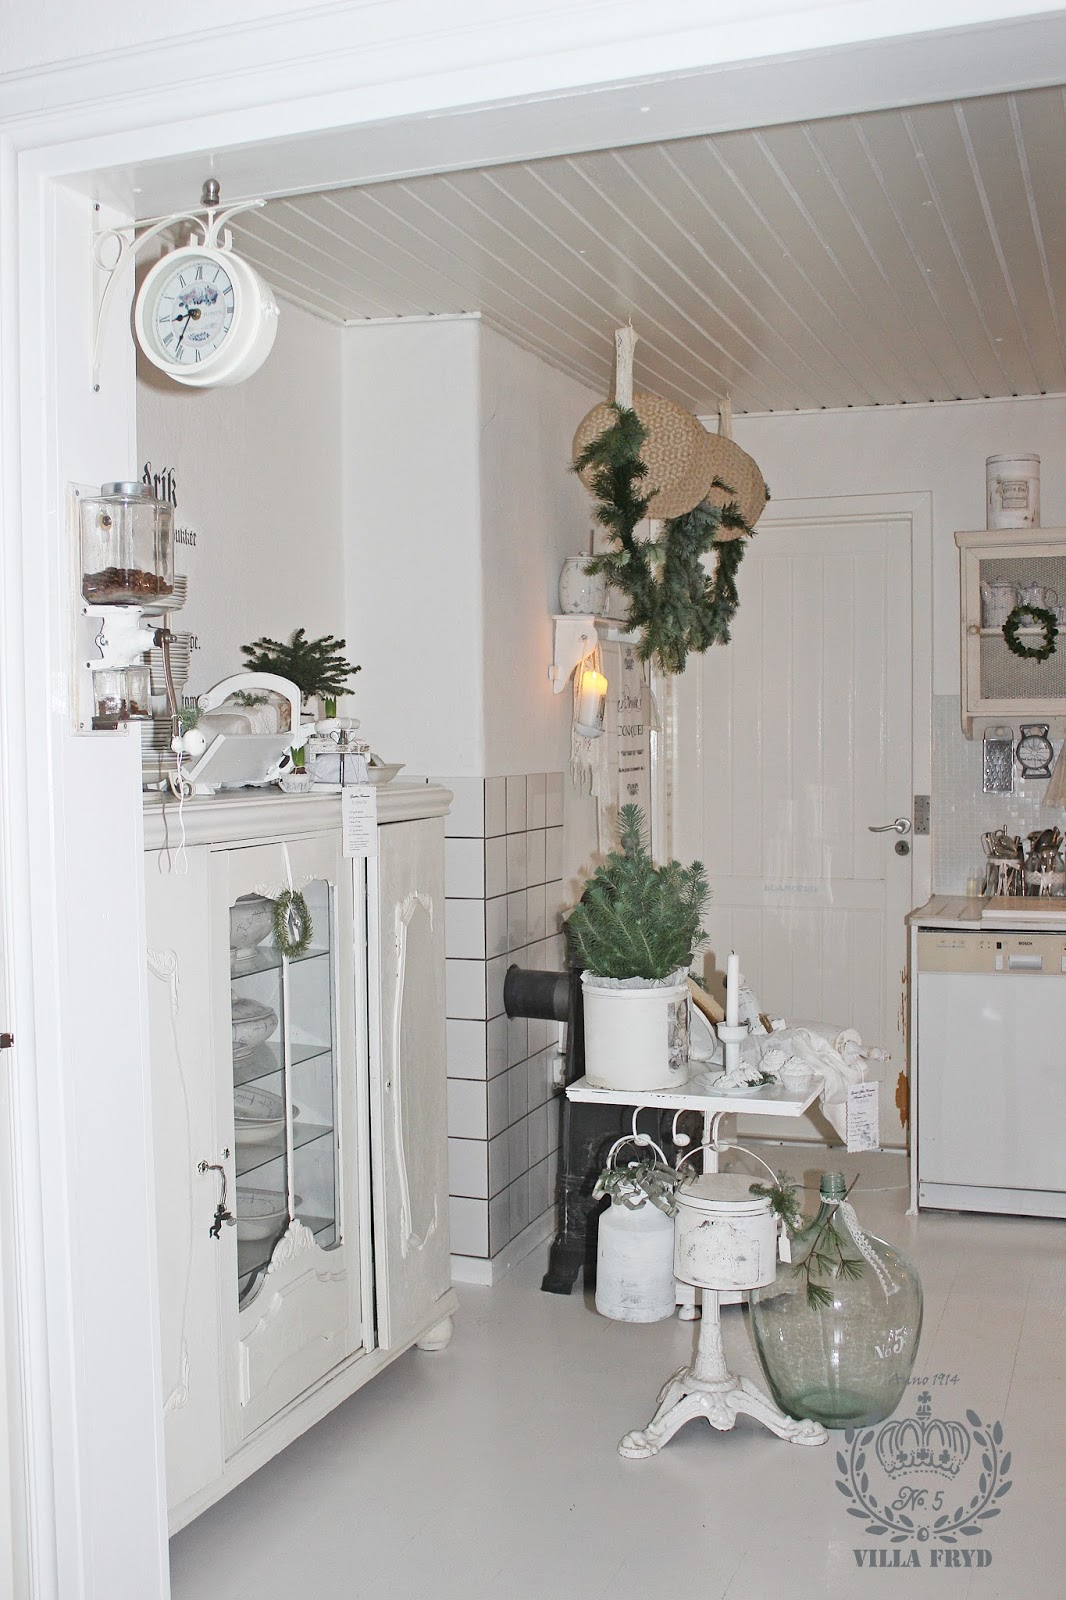 Hos Villa Fryd: Køkken hygge